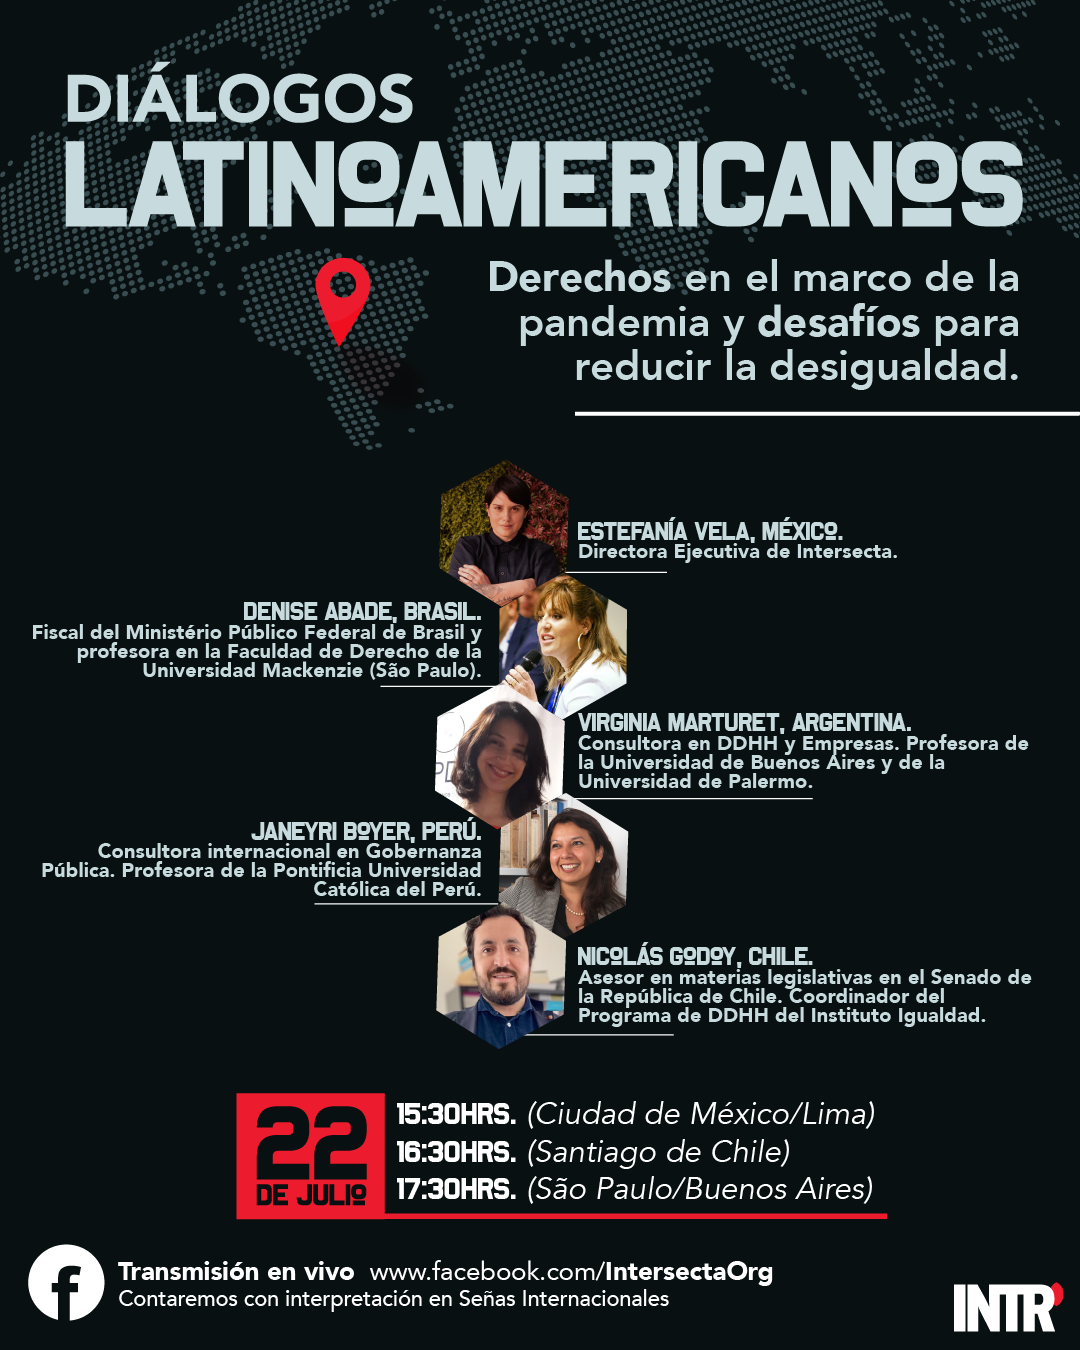 INTR_DiálogosLatinoamericanos_Insta